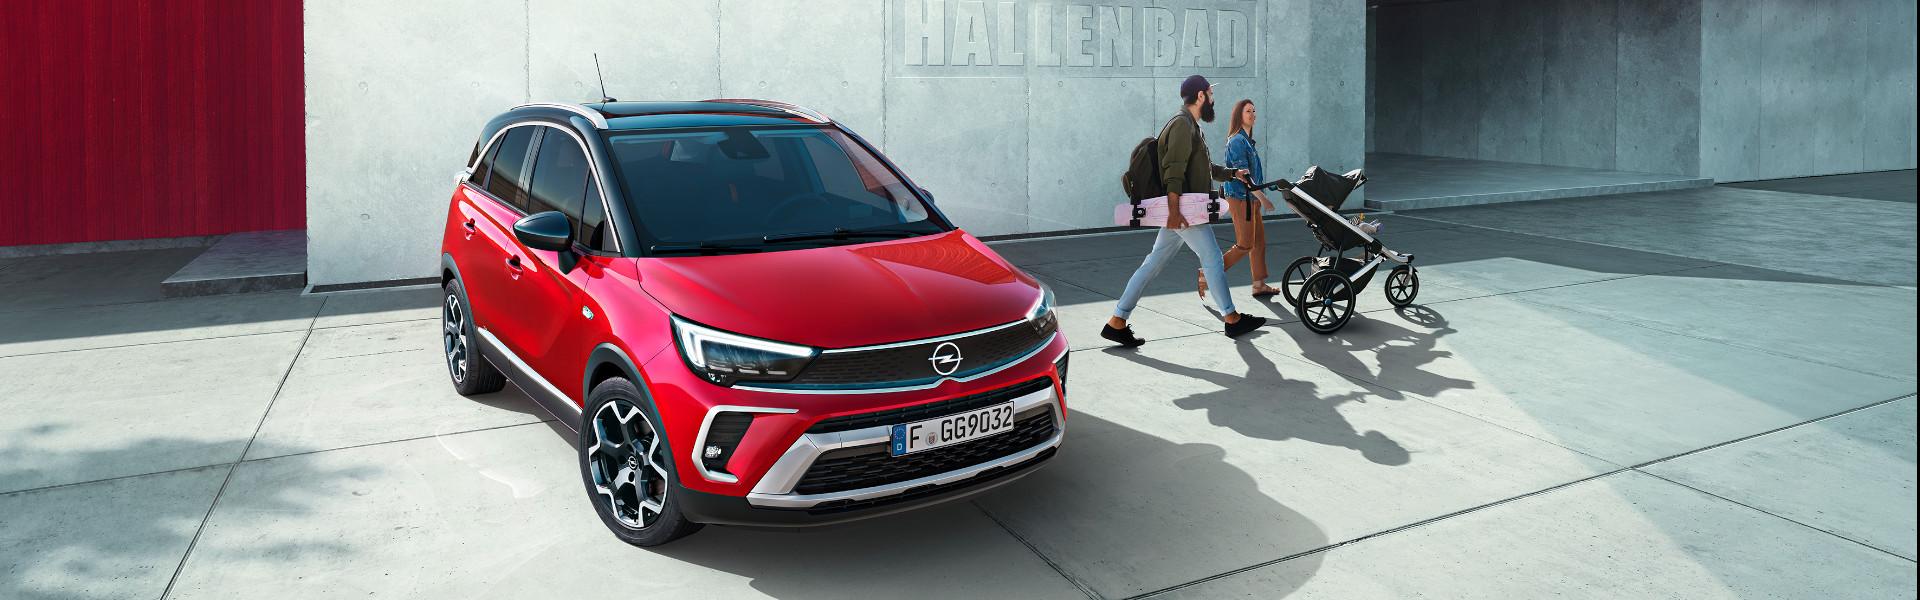 Der neue Opel Crossland X vor Hallenbad